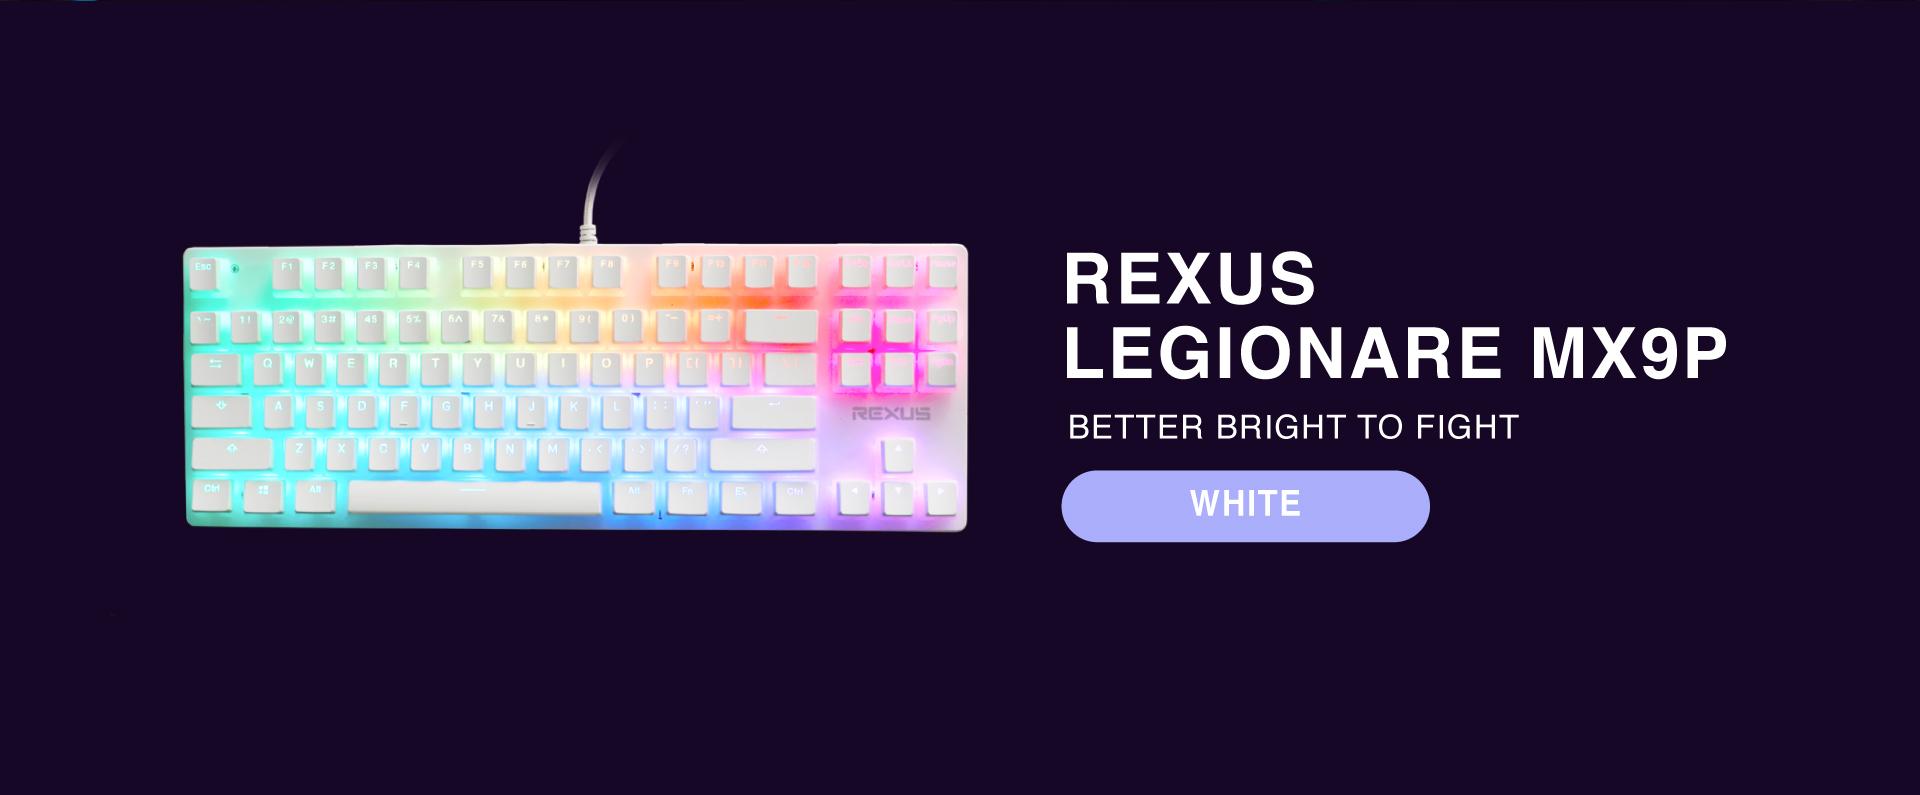 keyboard Rexus Legionare MX9P 2